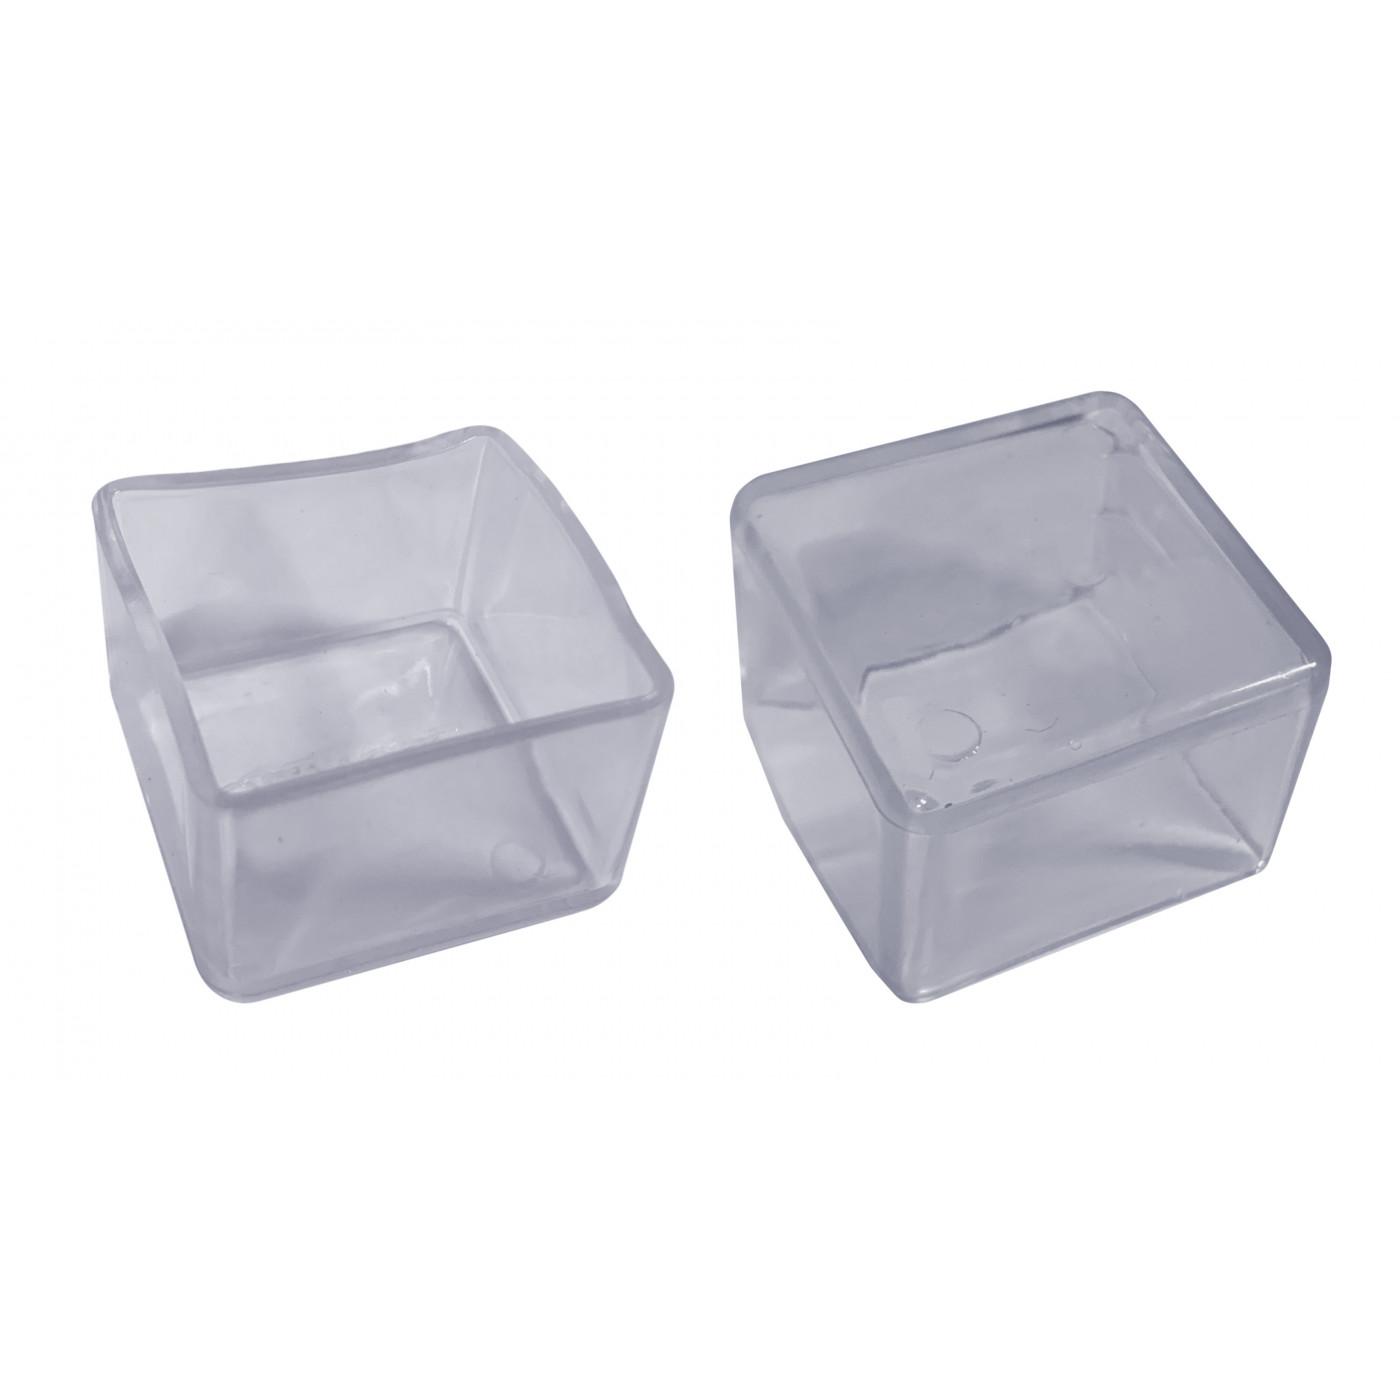 Juego de 32 tapas de silicona para patas de sillas (exteriores, cuadradas, 35 mm, transparentes) [O-SQ-35-T]  - 1